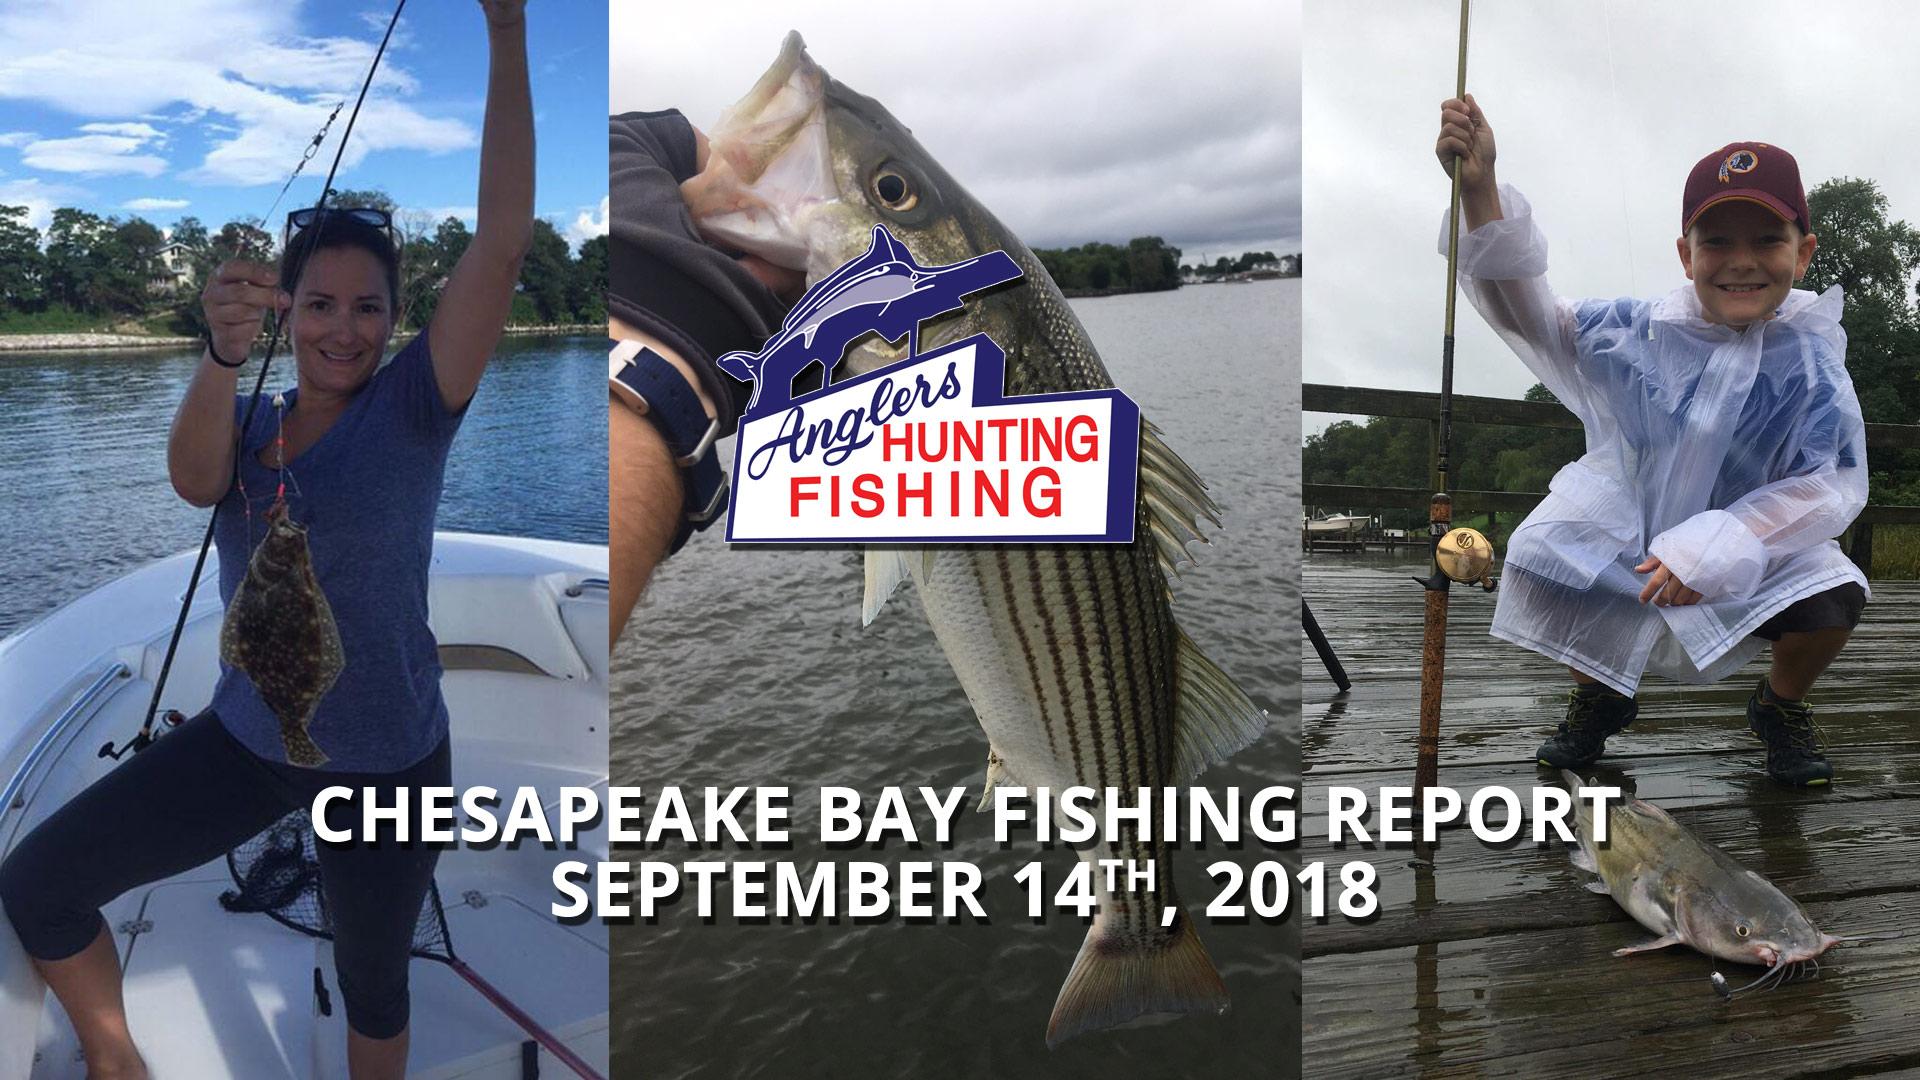 Chesapeake Bay Fishing Report - September 14th, 2018